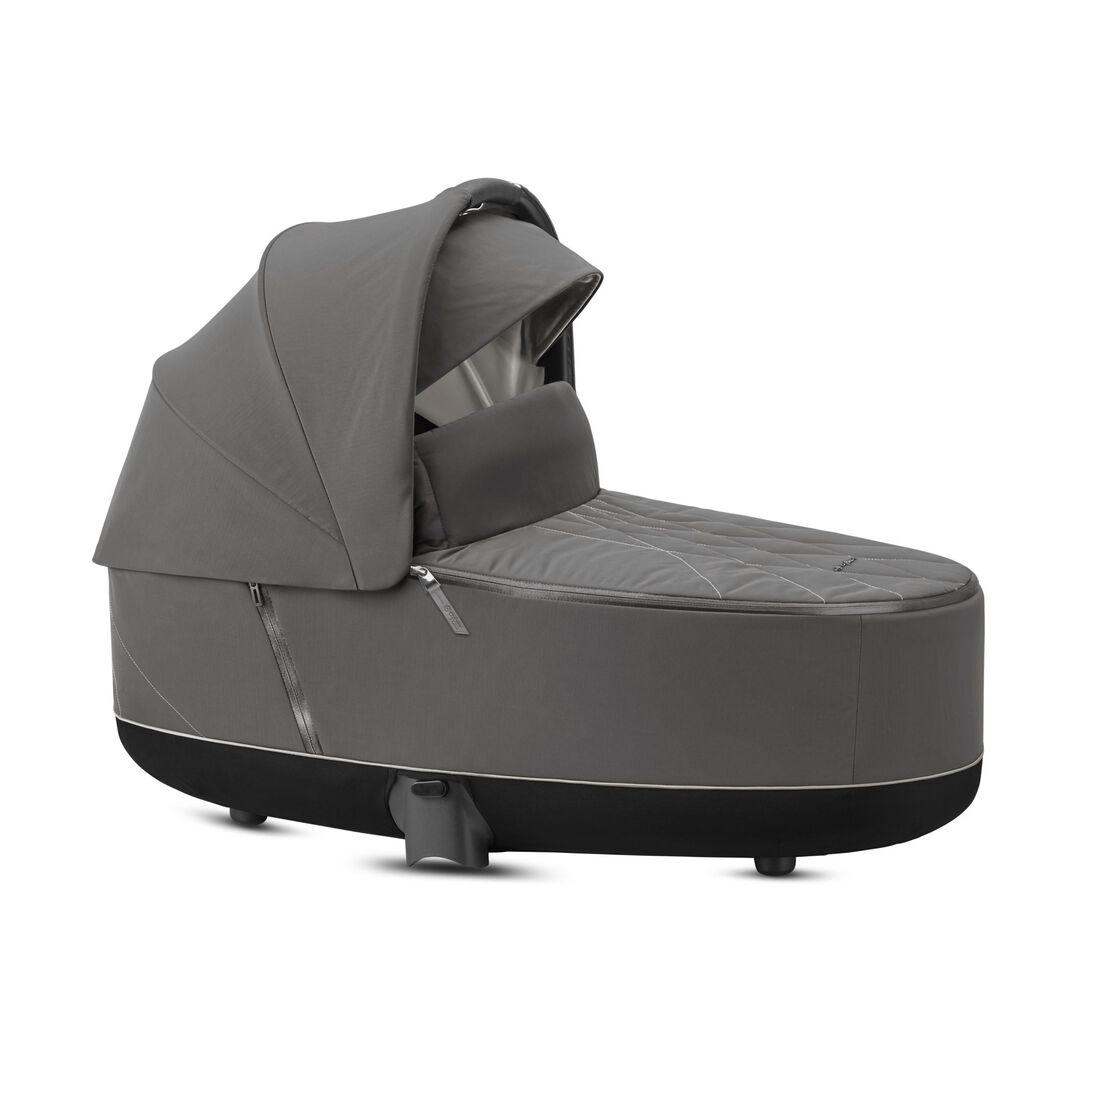 CYBEX Priam Lux Carry Cot - Soho Grey in Soho Grey large Bild 2